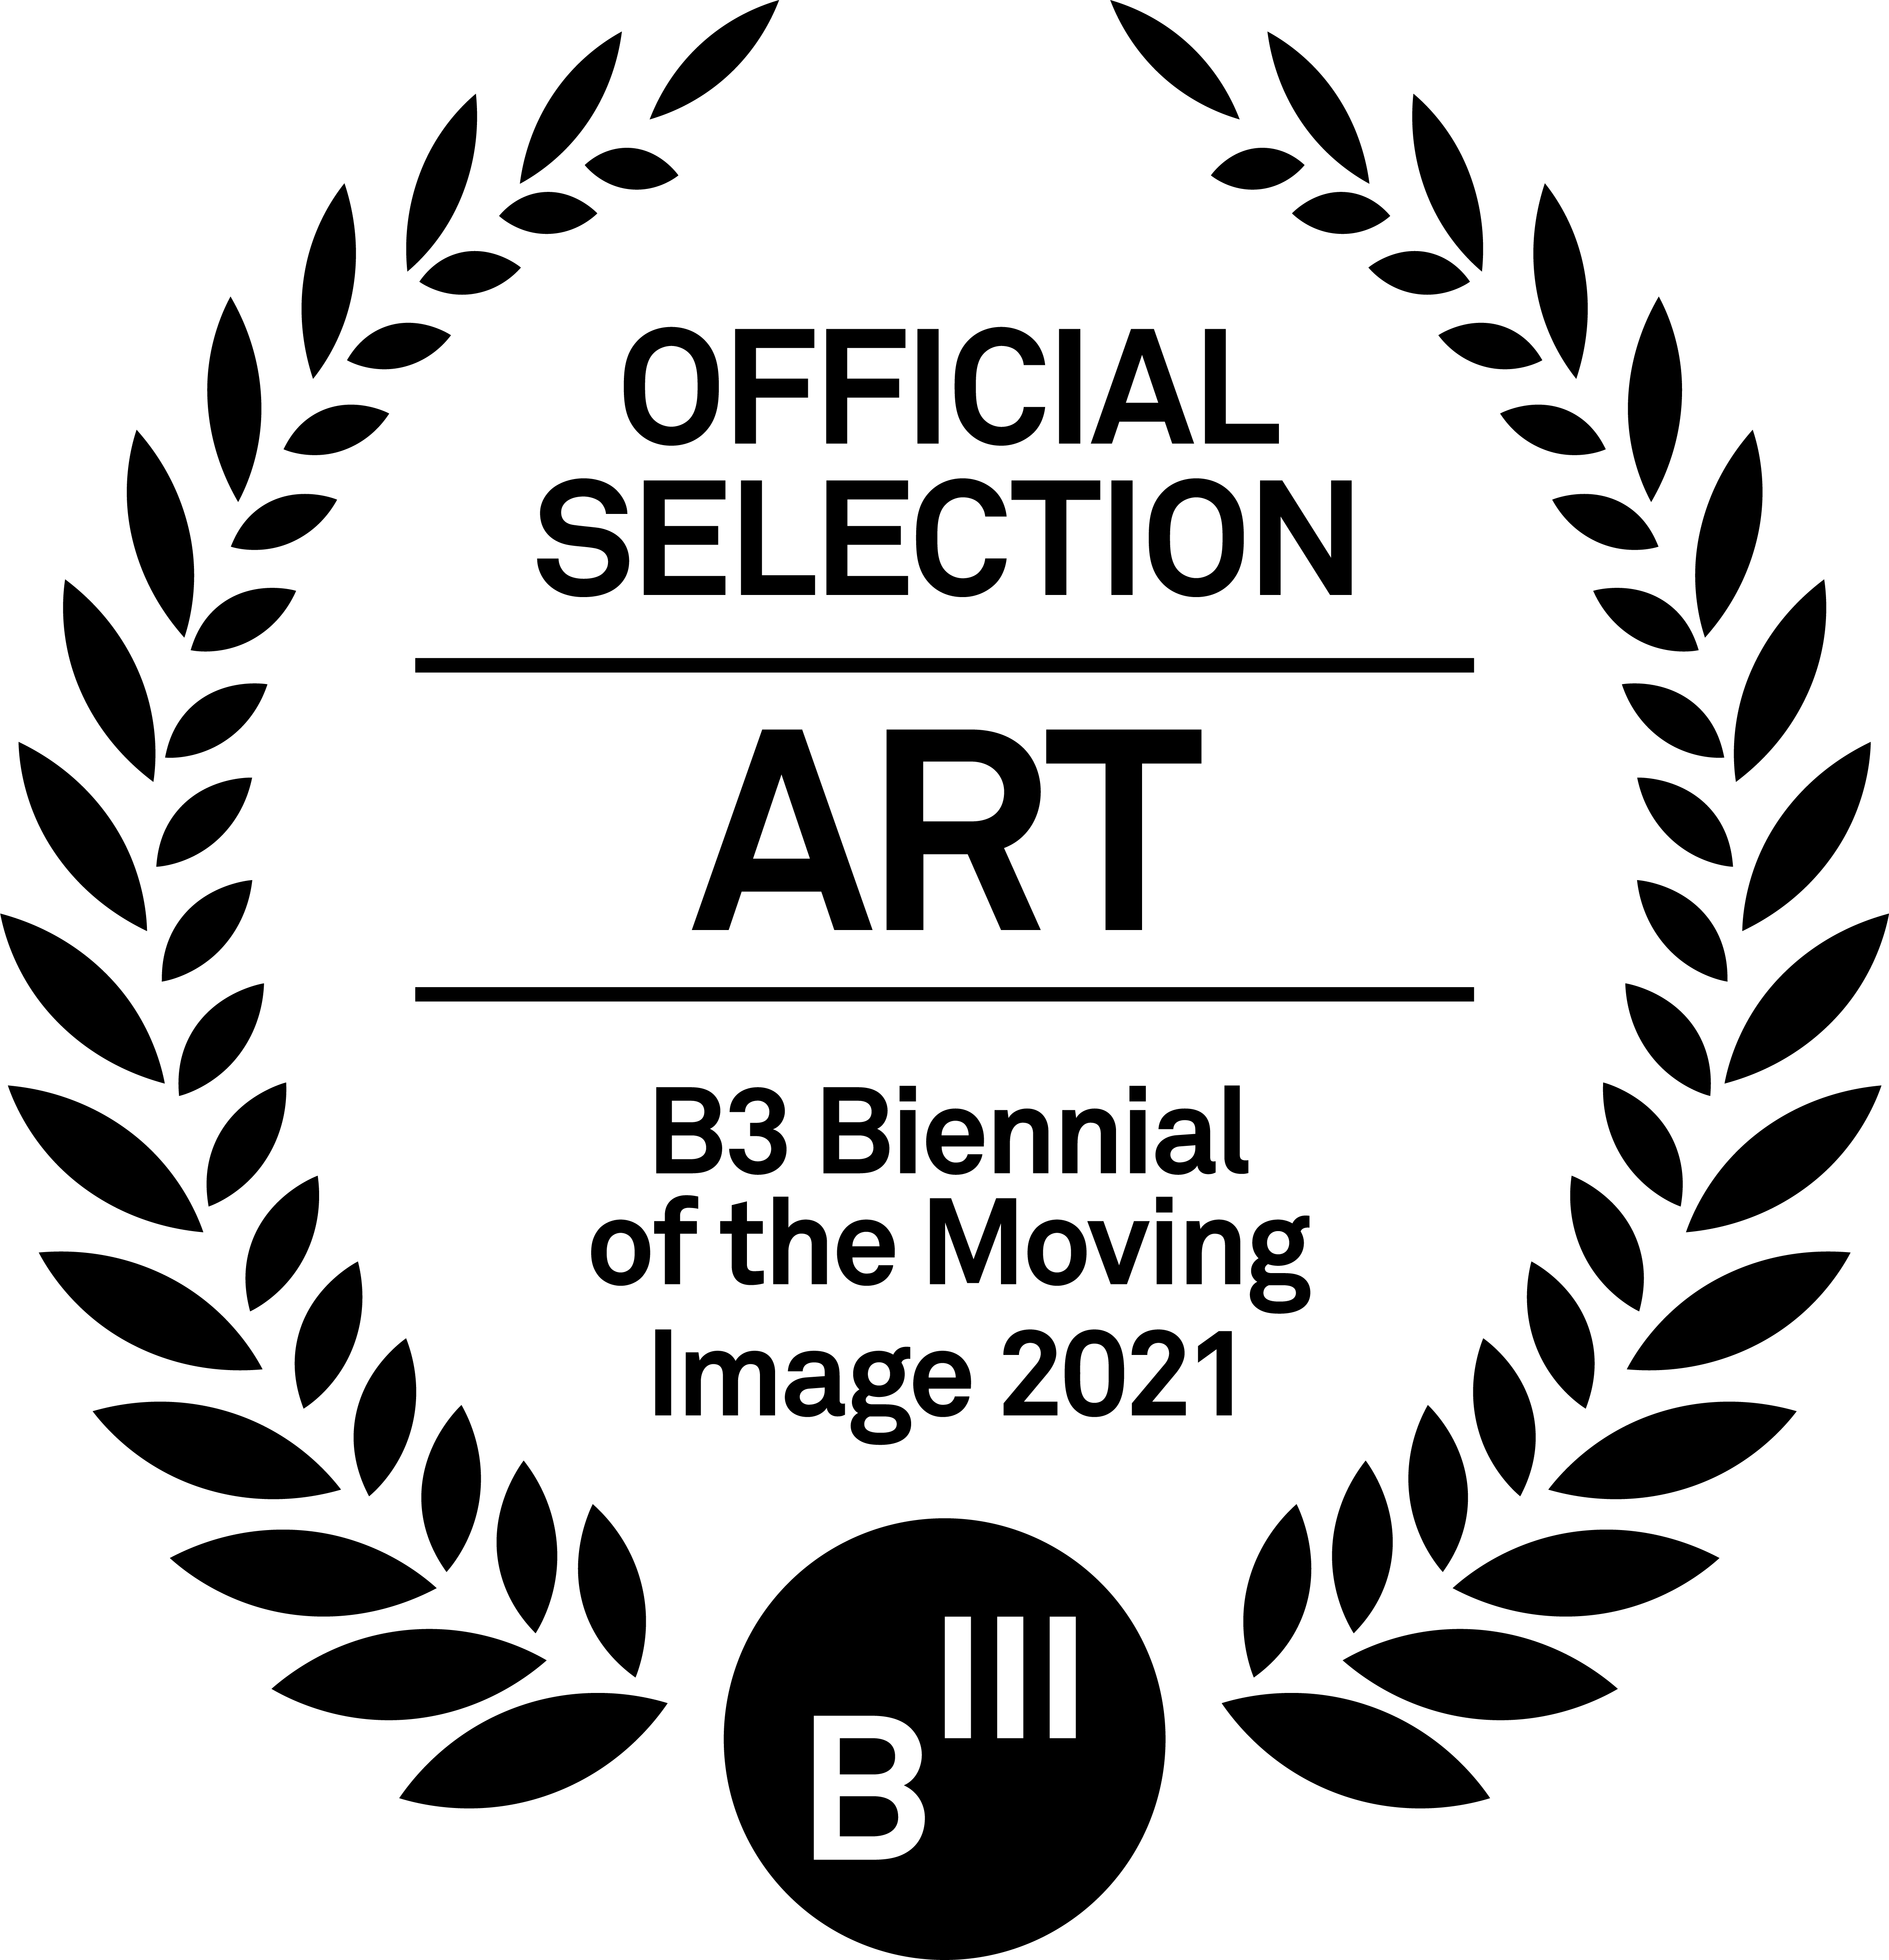 B3 Biennale